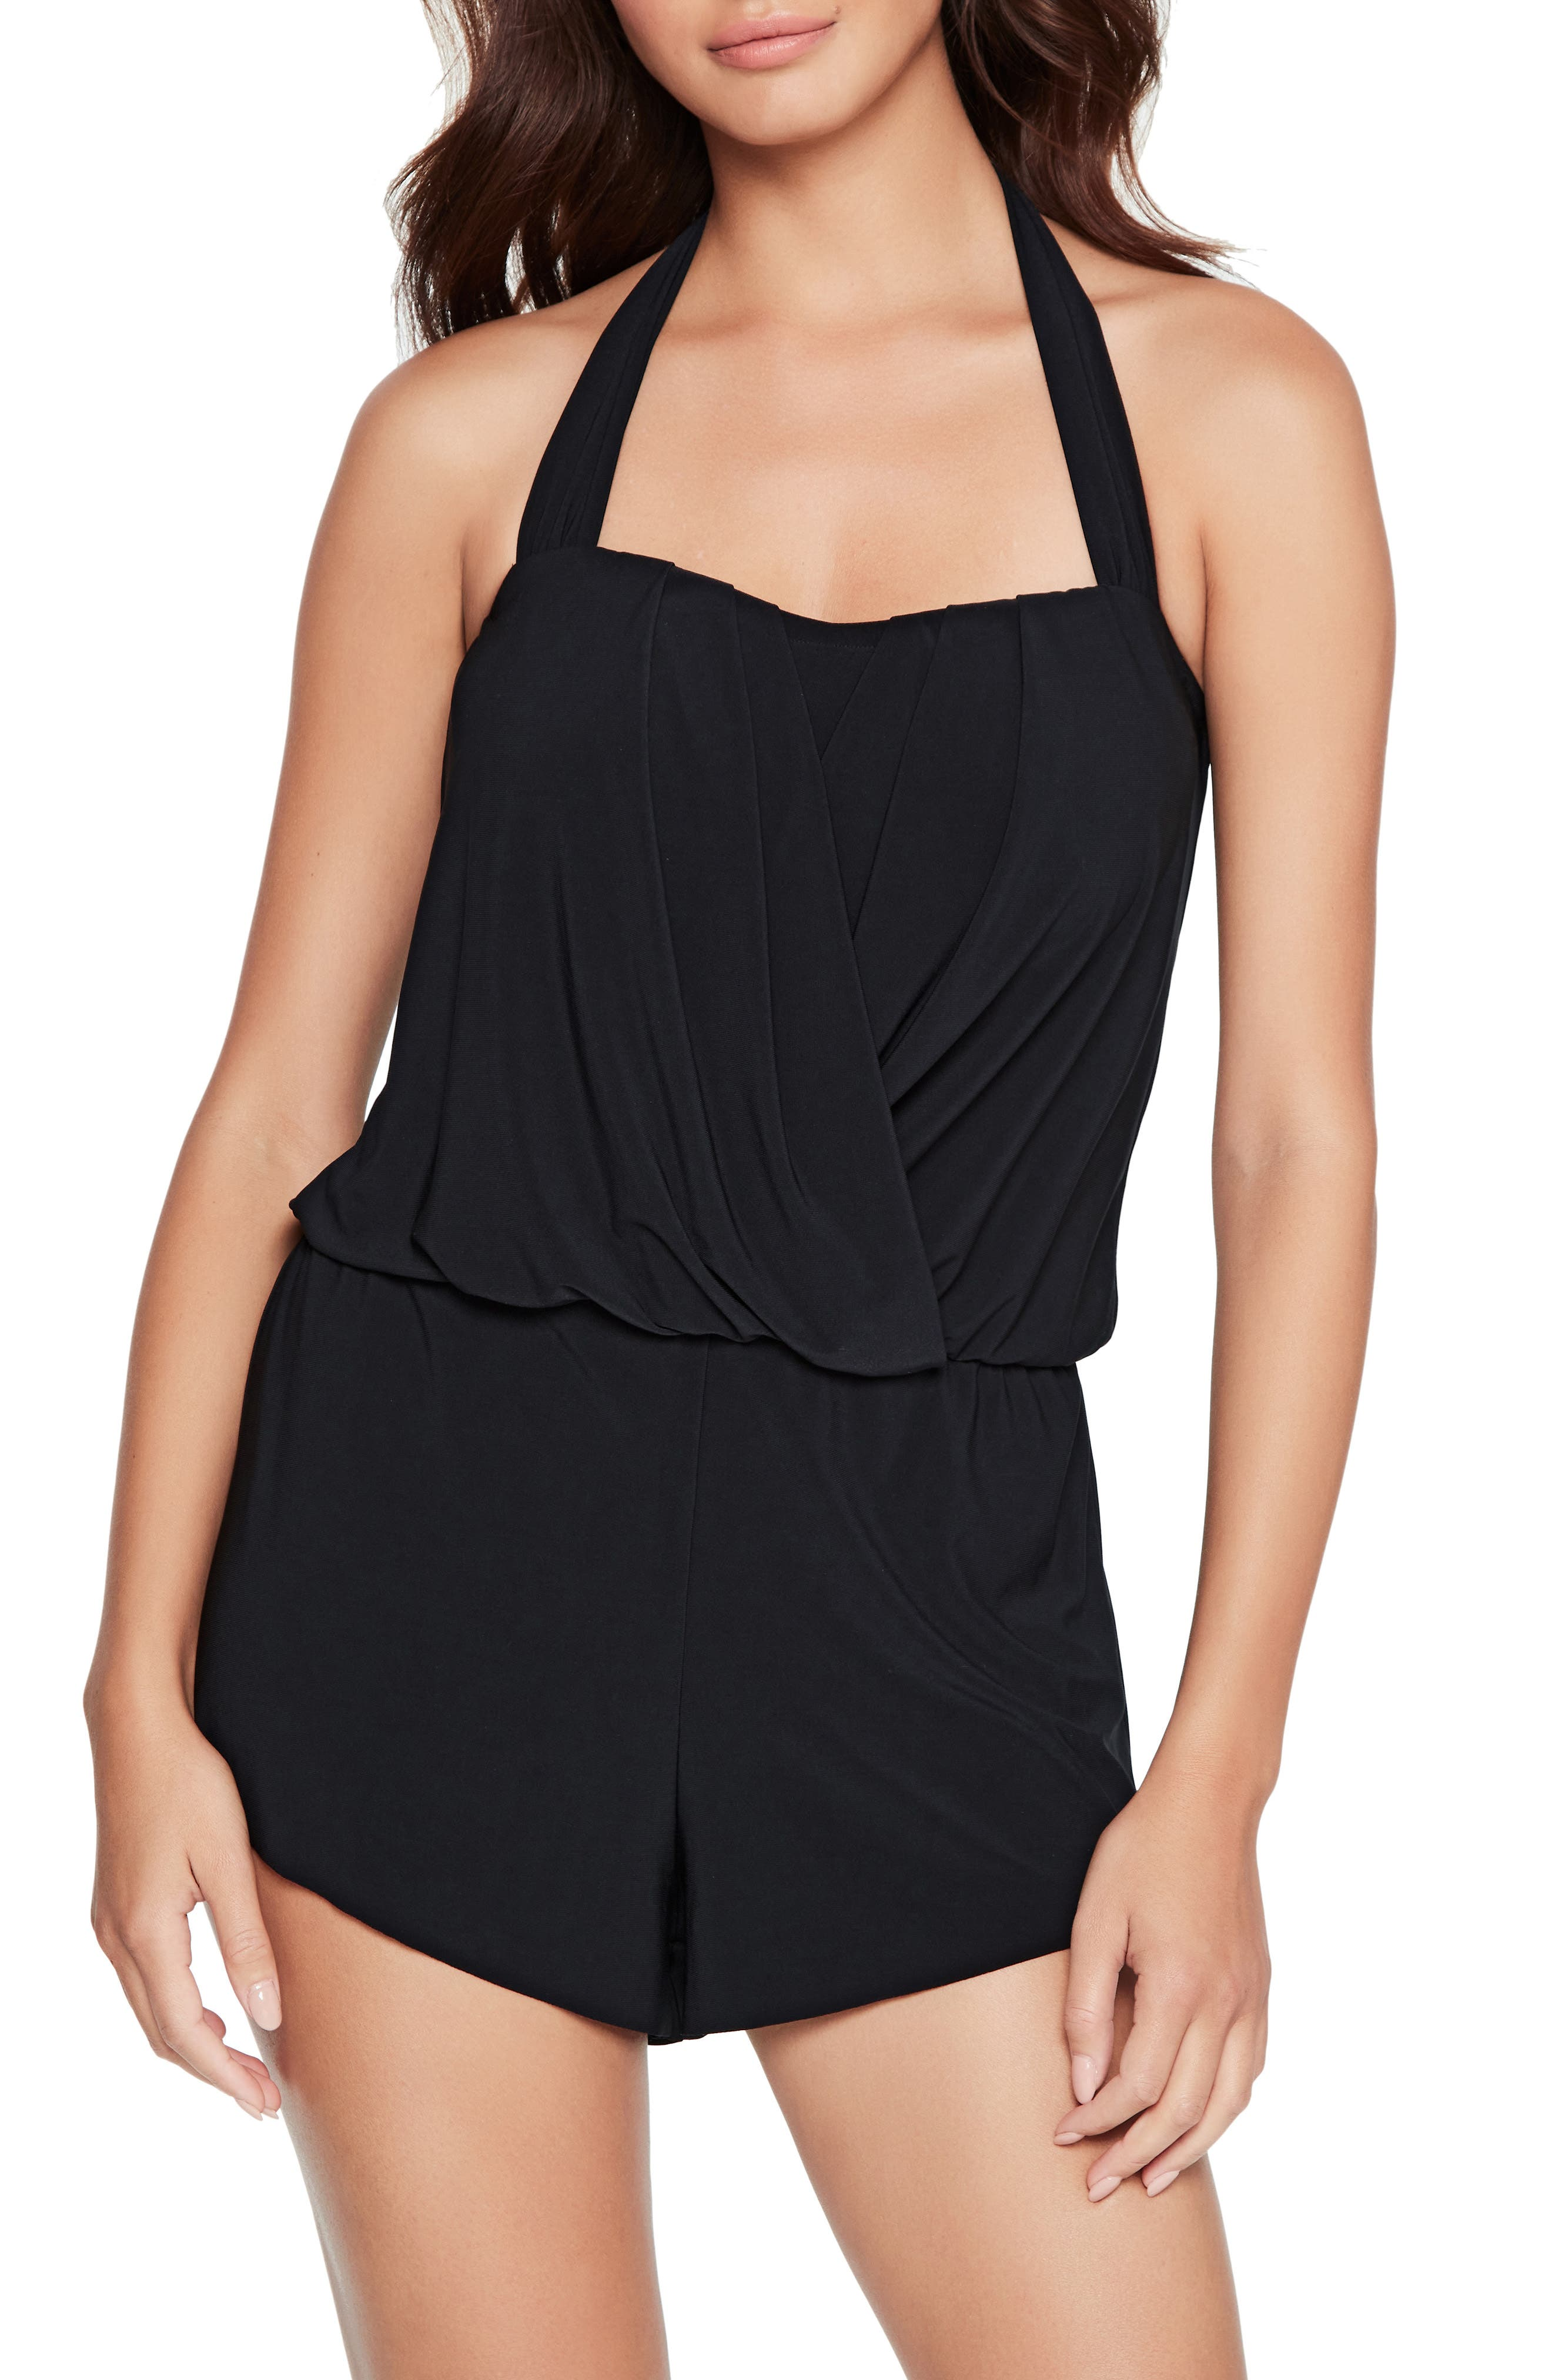 Women's Magicsuit Brooke Solid One-Piece Romper Swimsuit